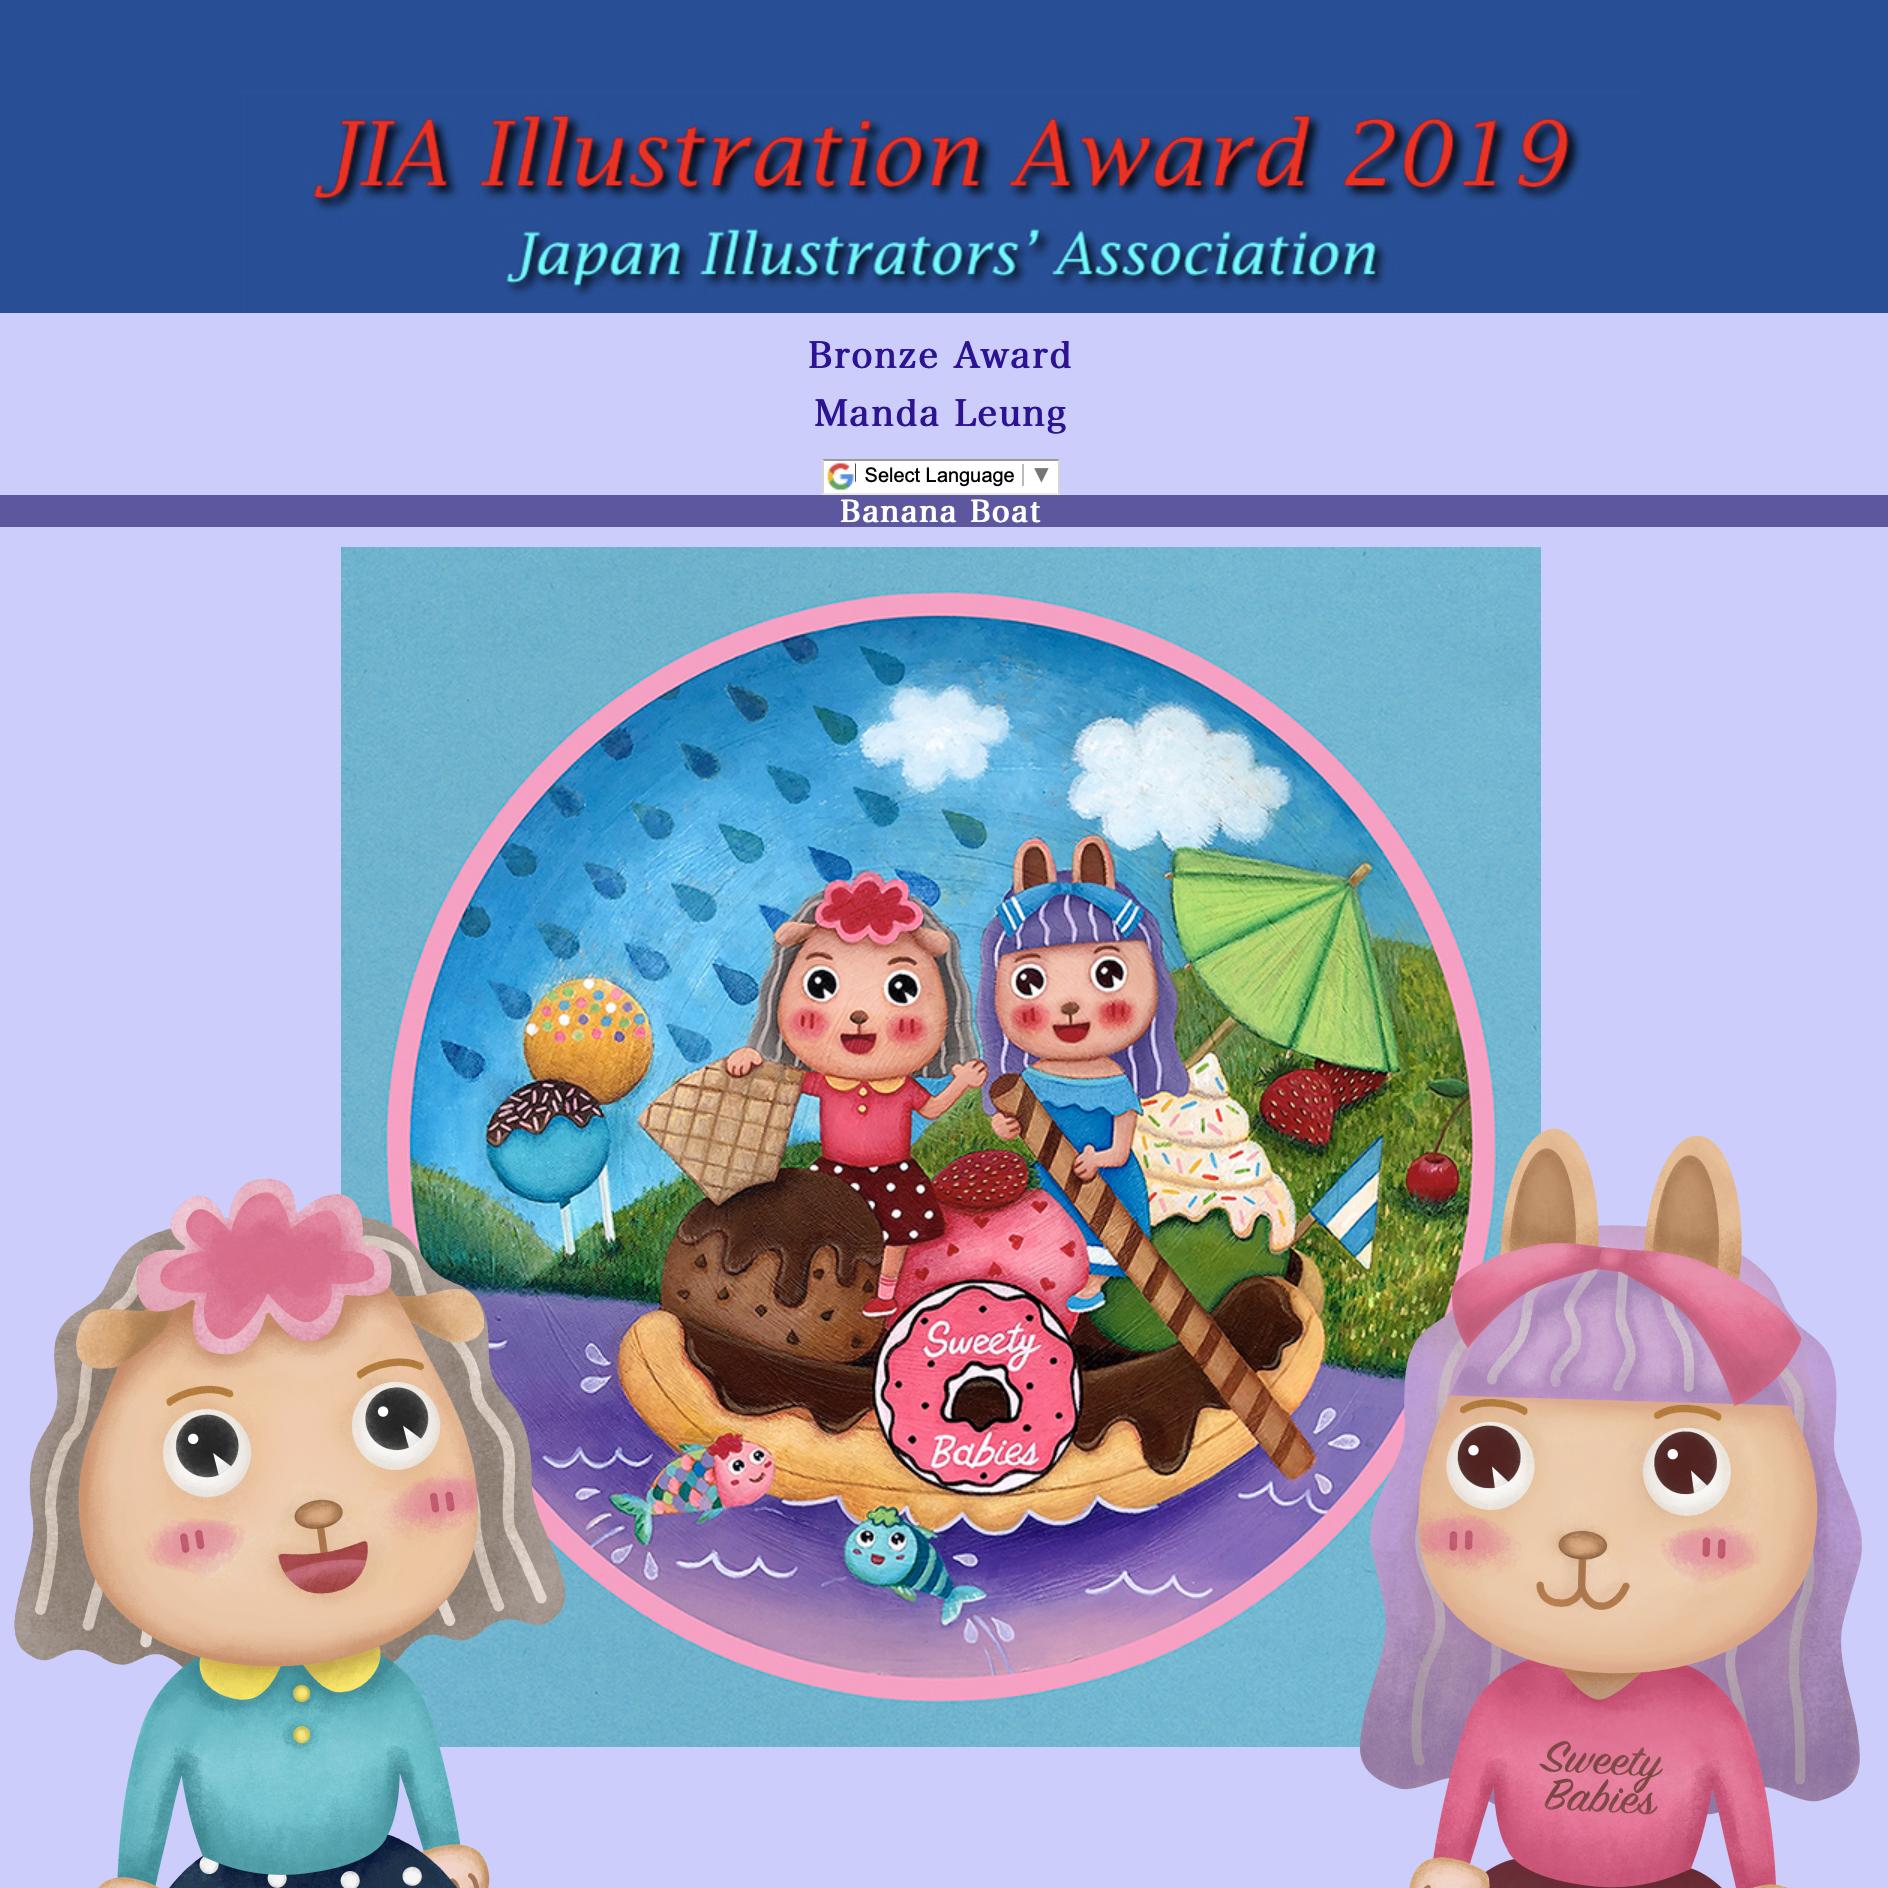 JIA Illustration Award 2019